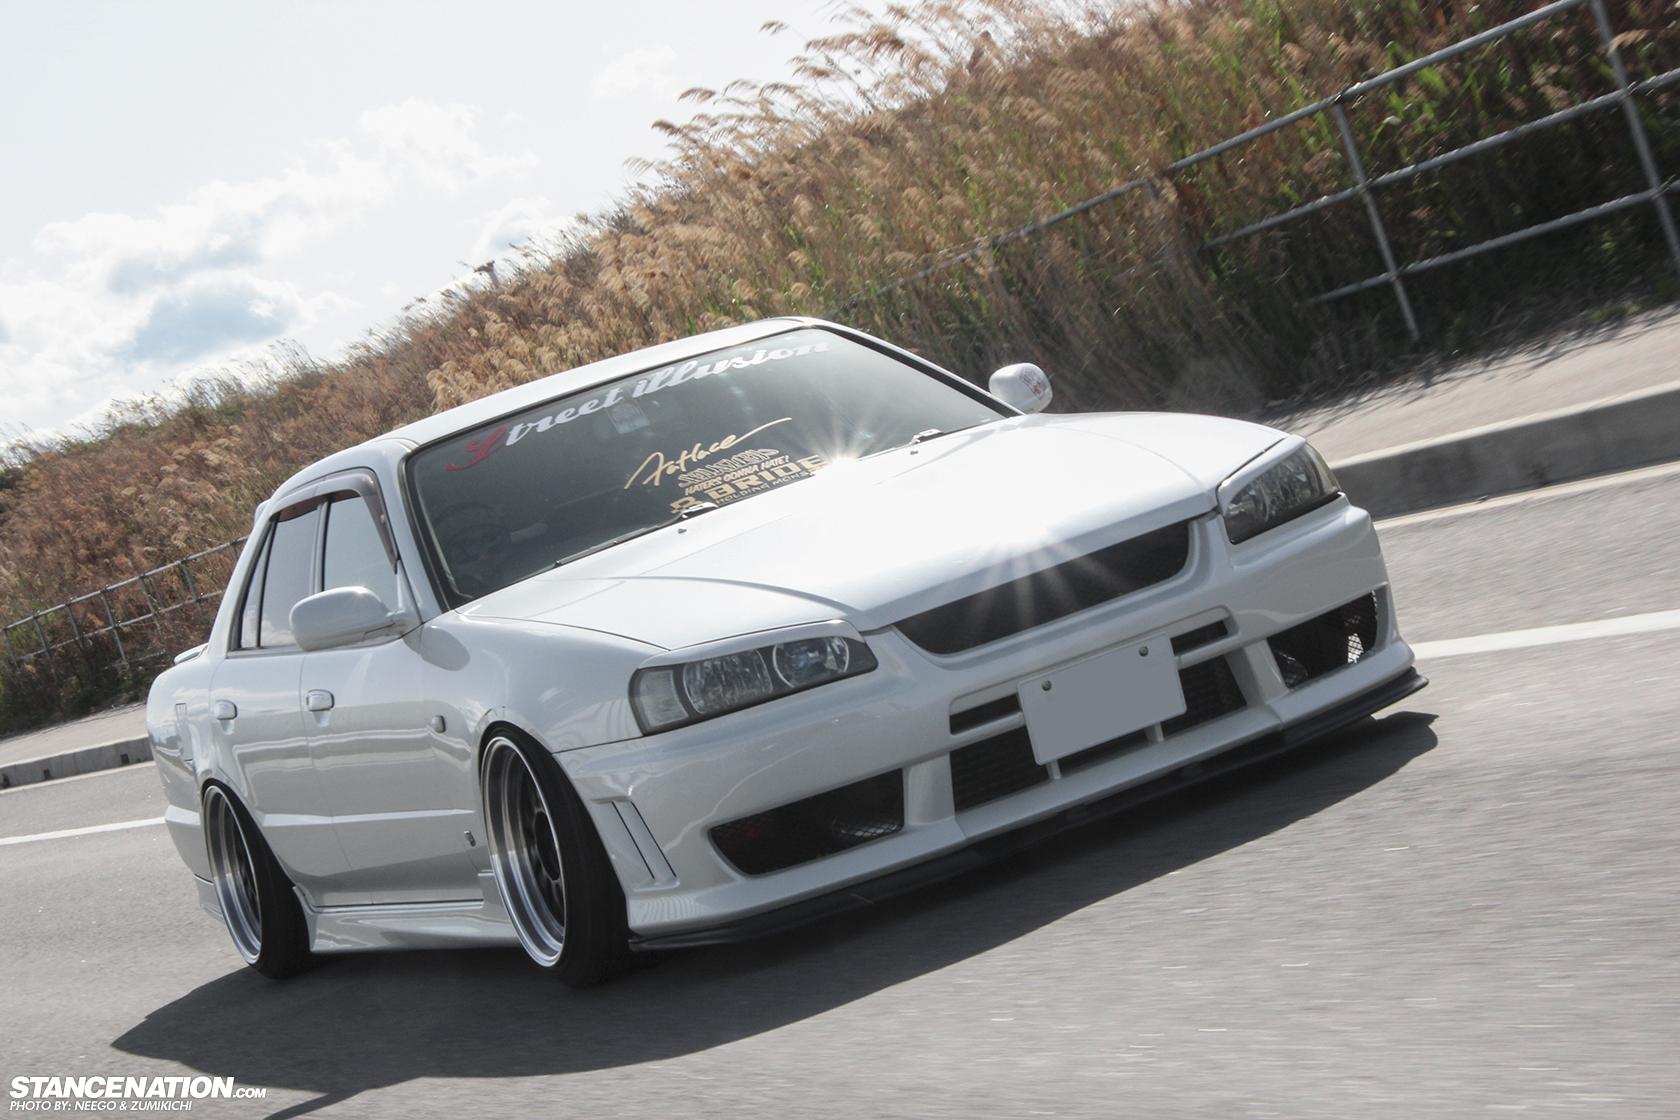 The Forgotten One Kazuyuki S Nissan Skyline